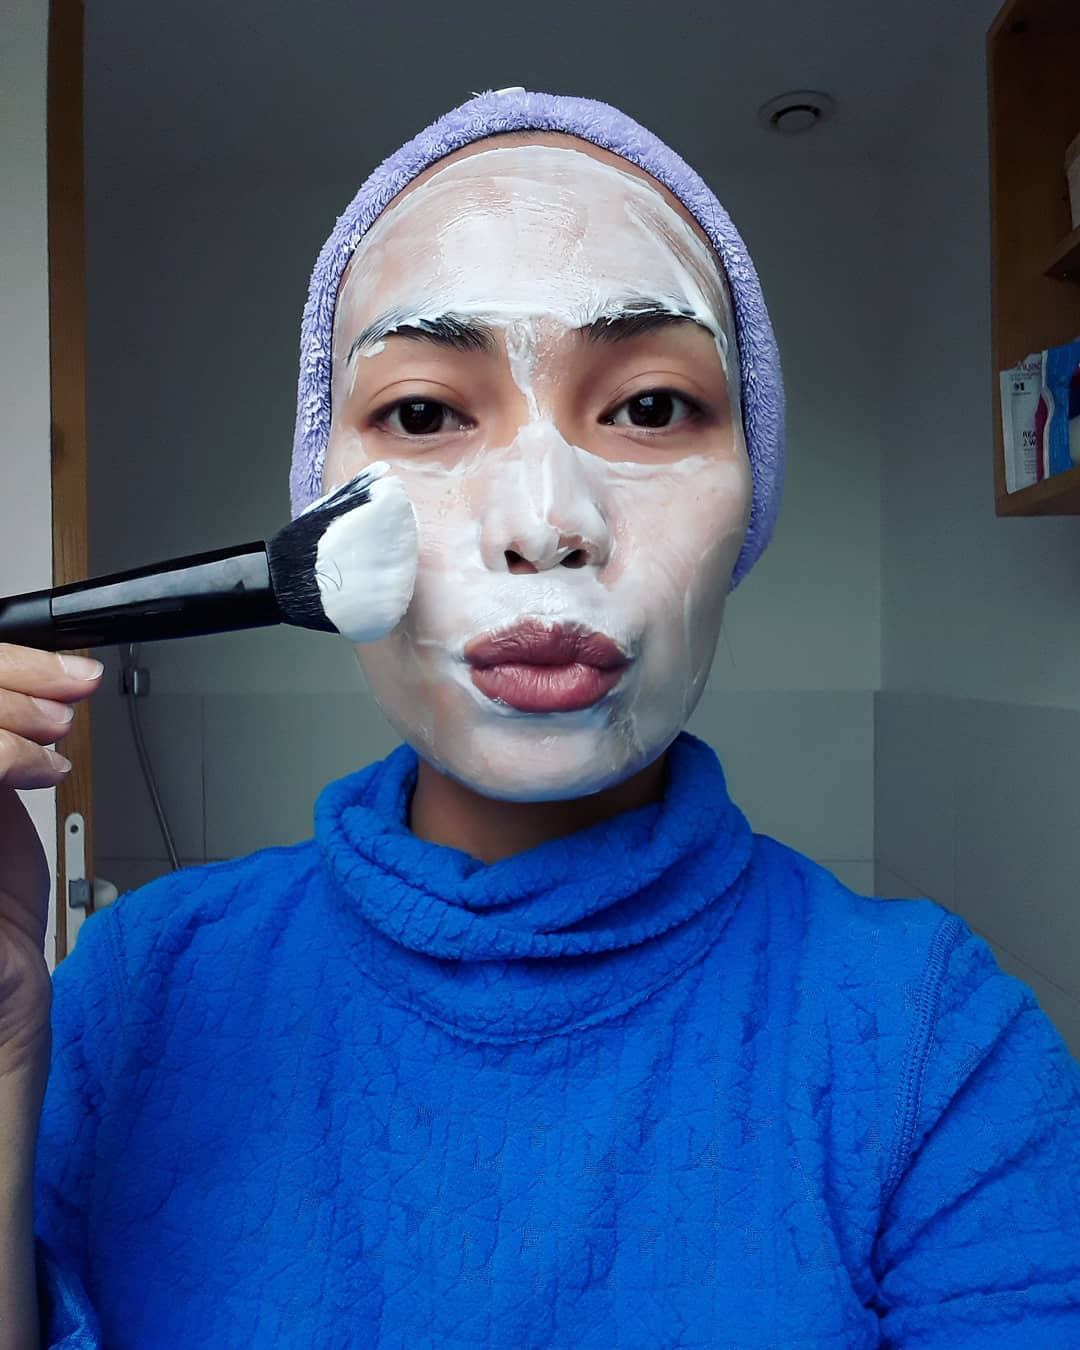 Expiring food: Yoghurt face mask